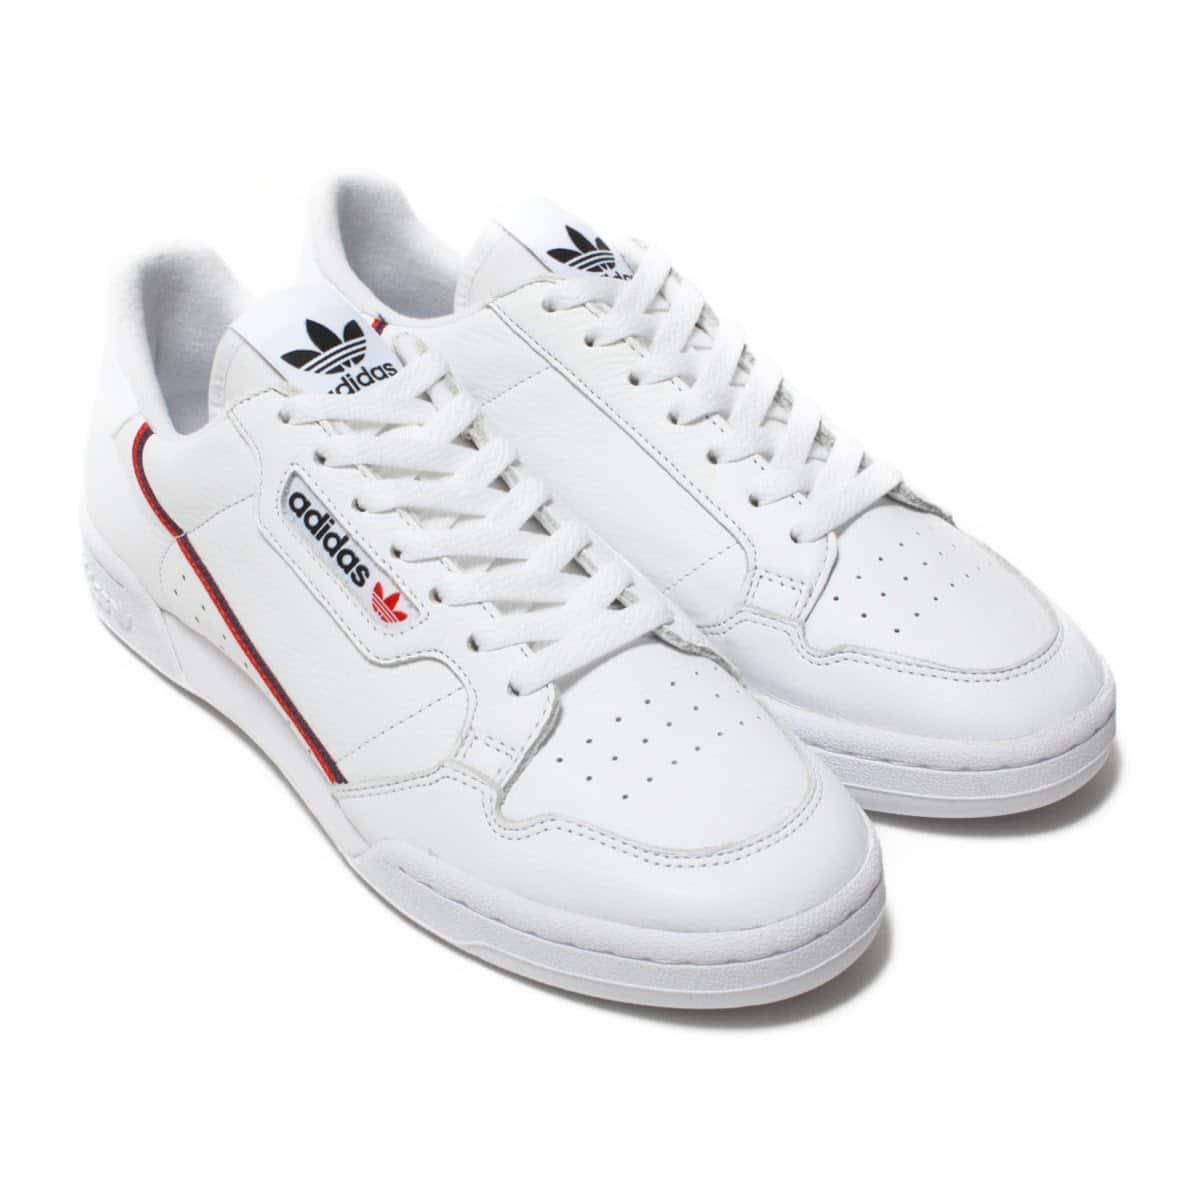 adidas Originals CONTINENTAL 80  FTWR WHITE/SCARLET/COLLEGIATE NAVY_photo_large